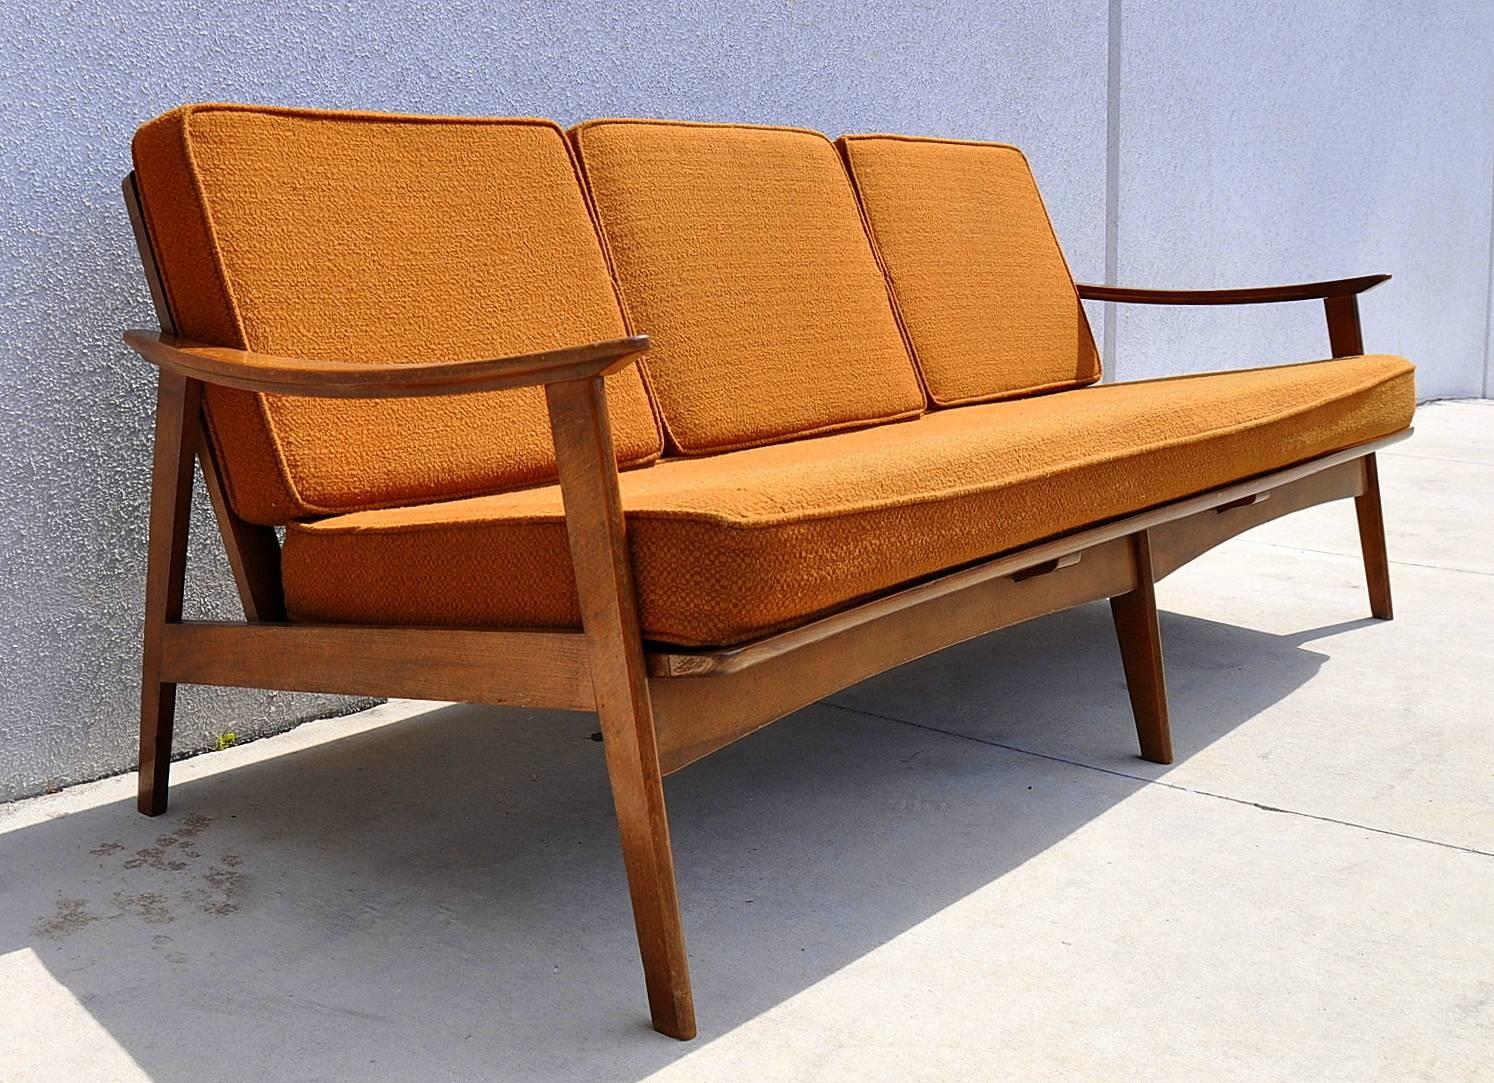 Select Modern intended for Modern Danish Sofas (Image 14 of 15)